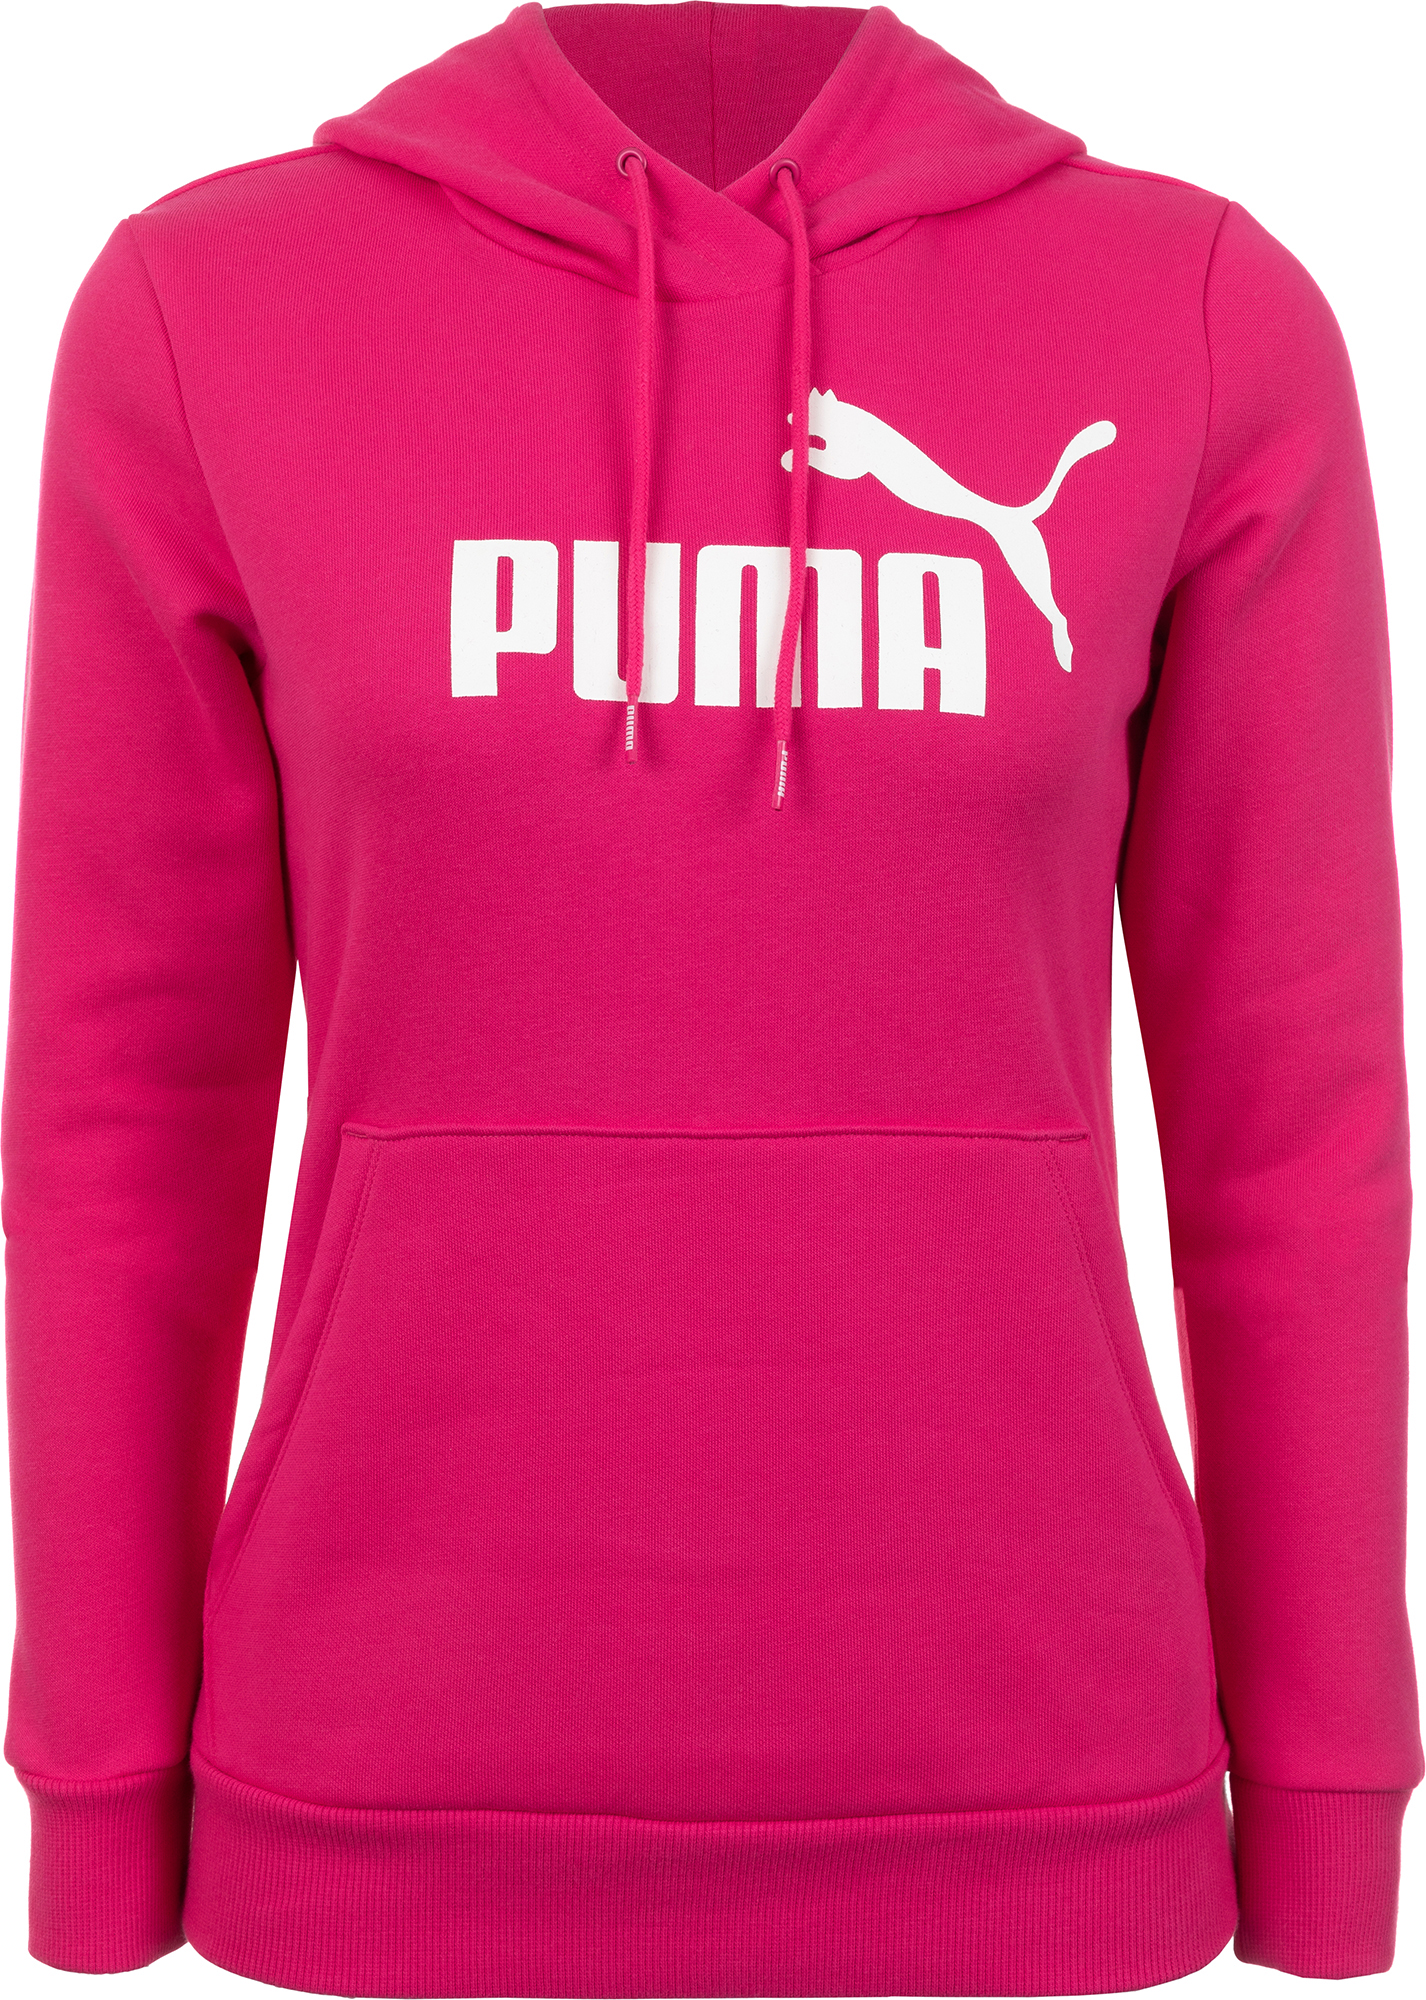 Puma Джемпер женский Puma Ess Logo, размер 48-50